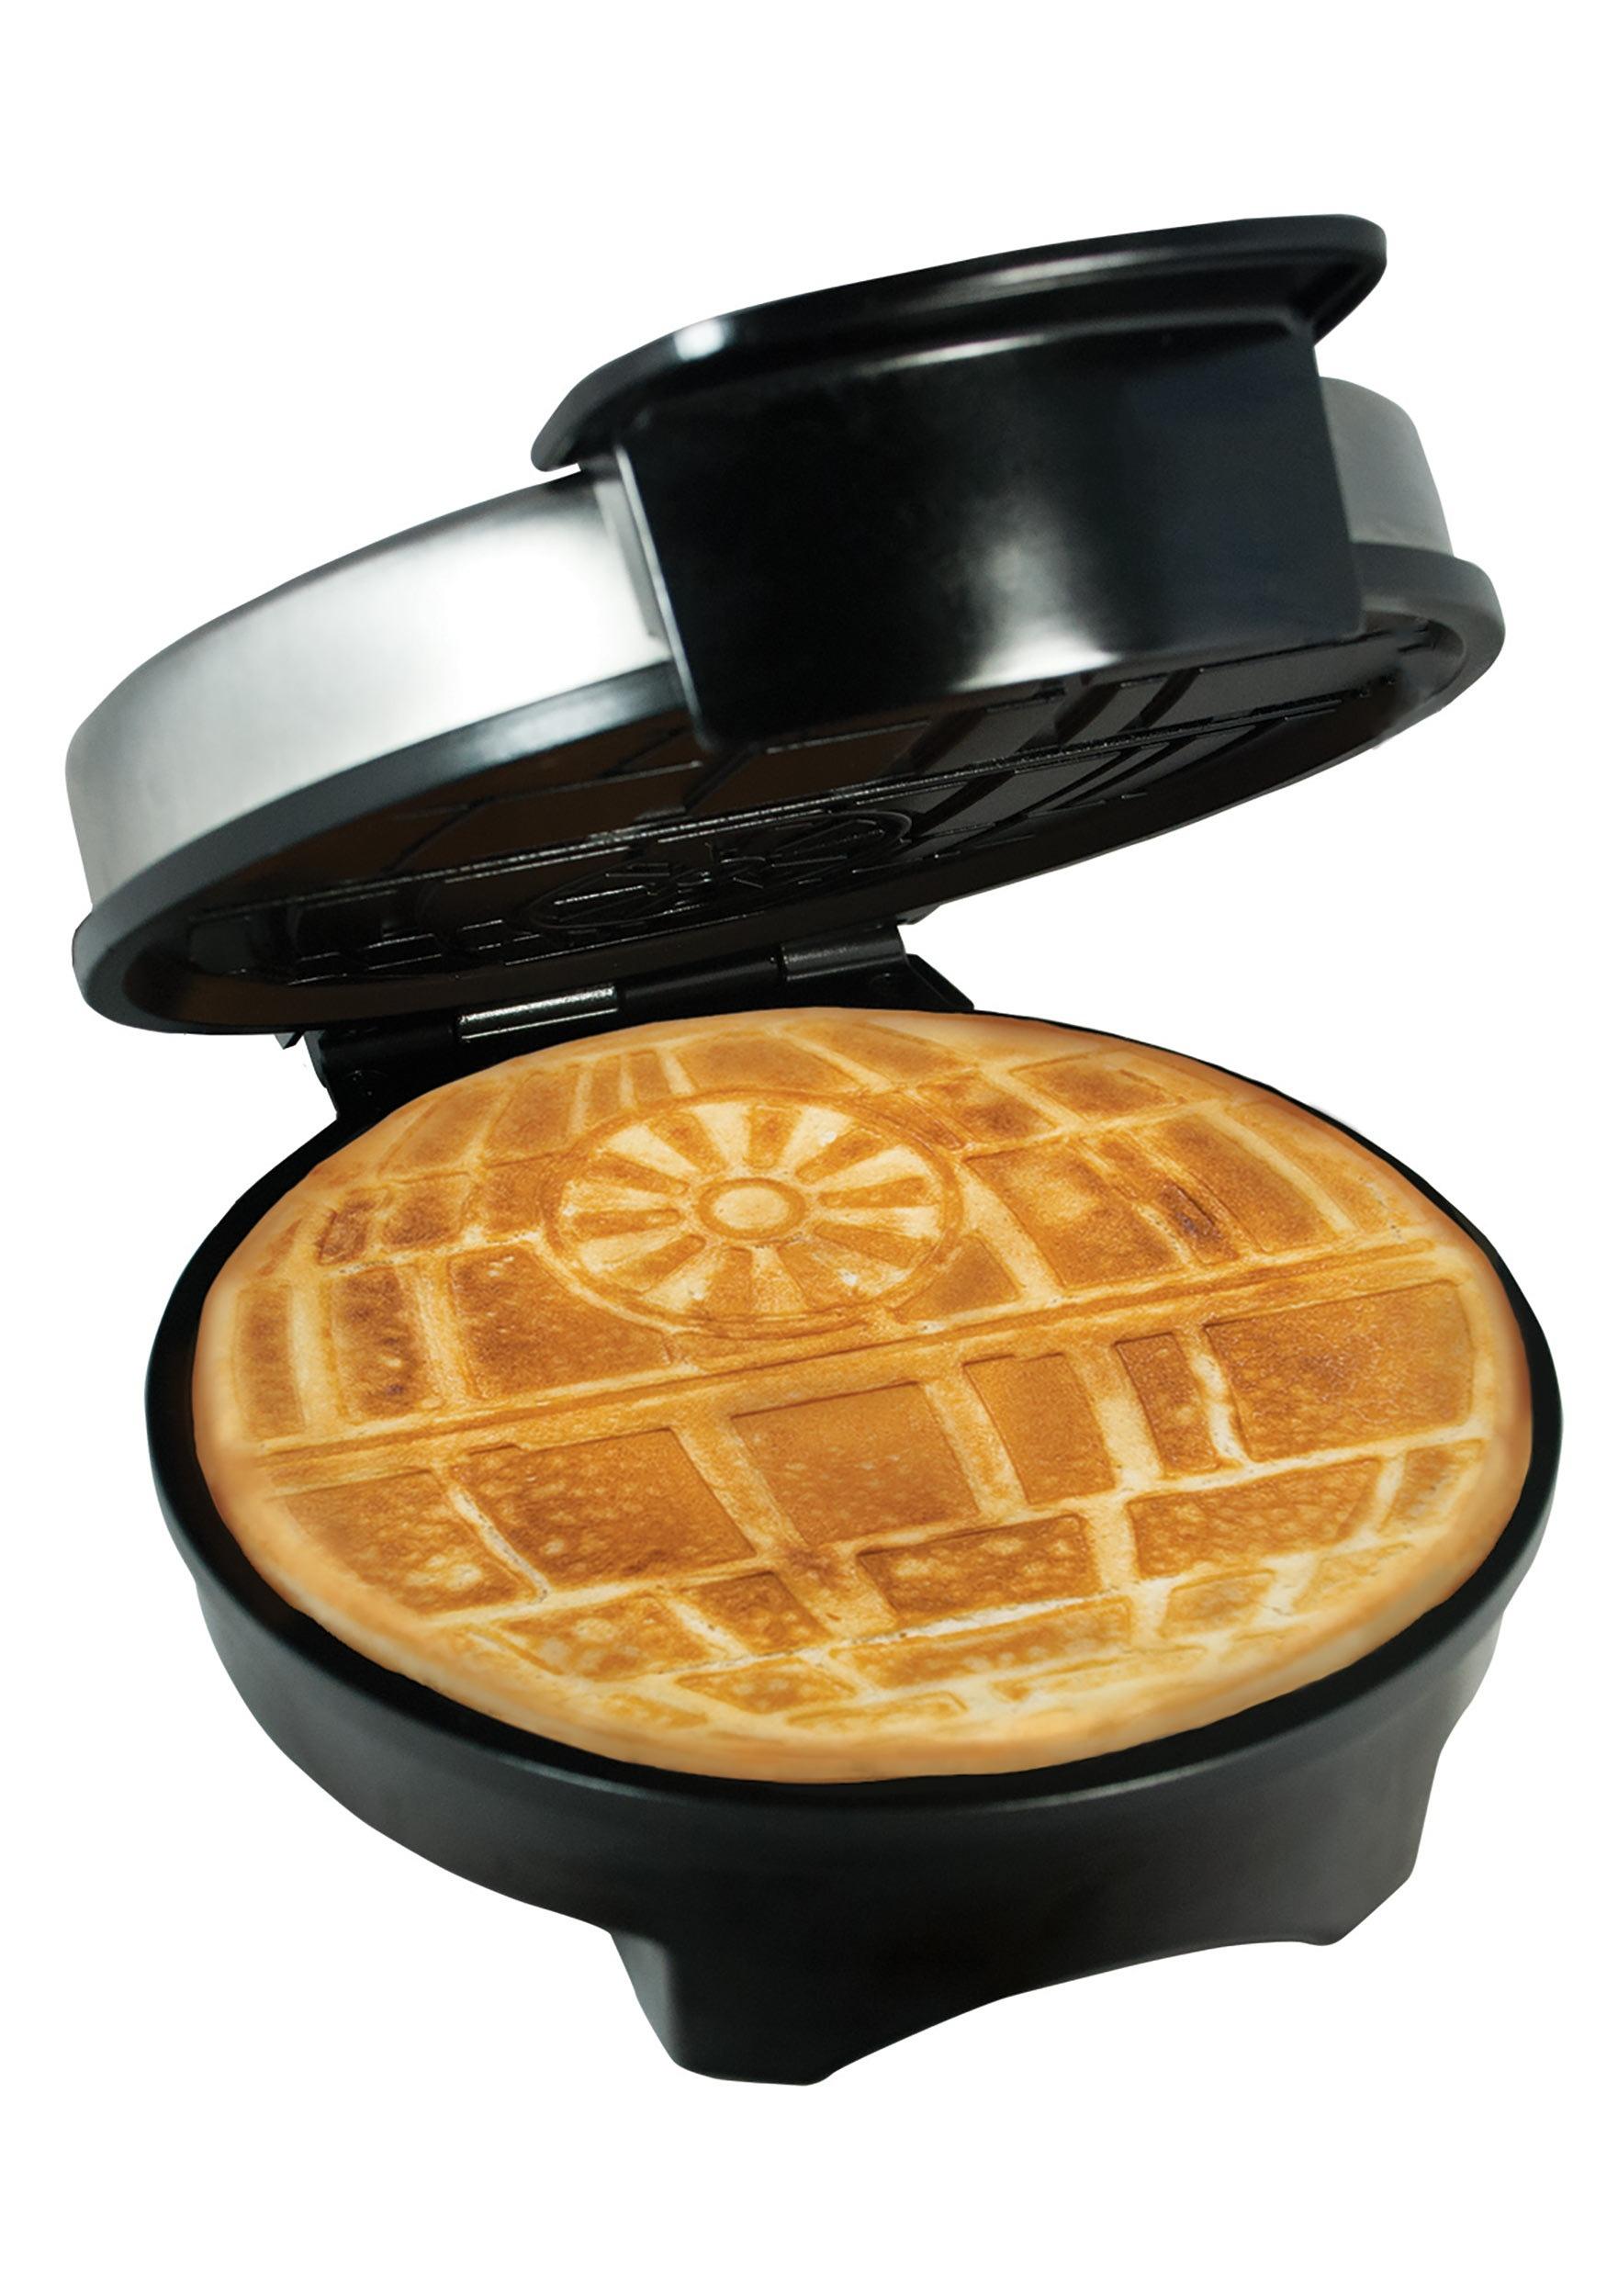 Star Wars Death Star Waffle Maker PBWM-SRW-RD-DST-S